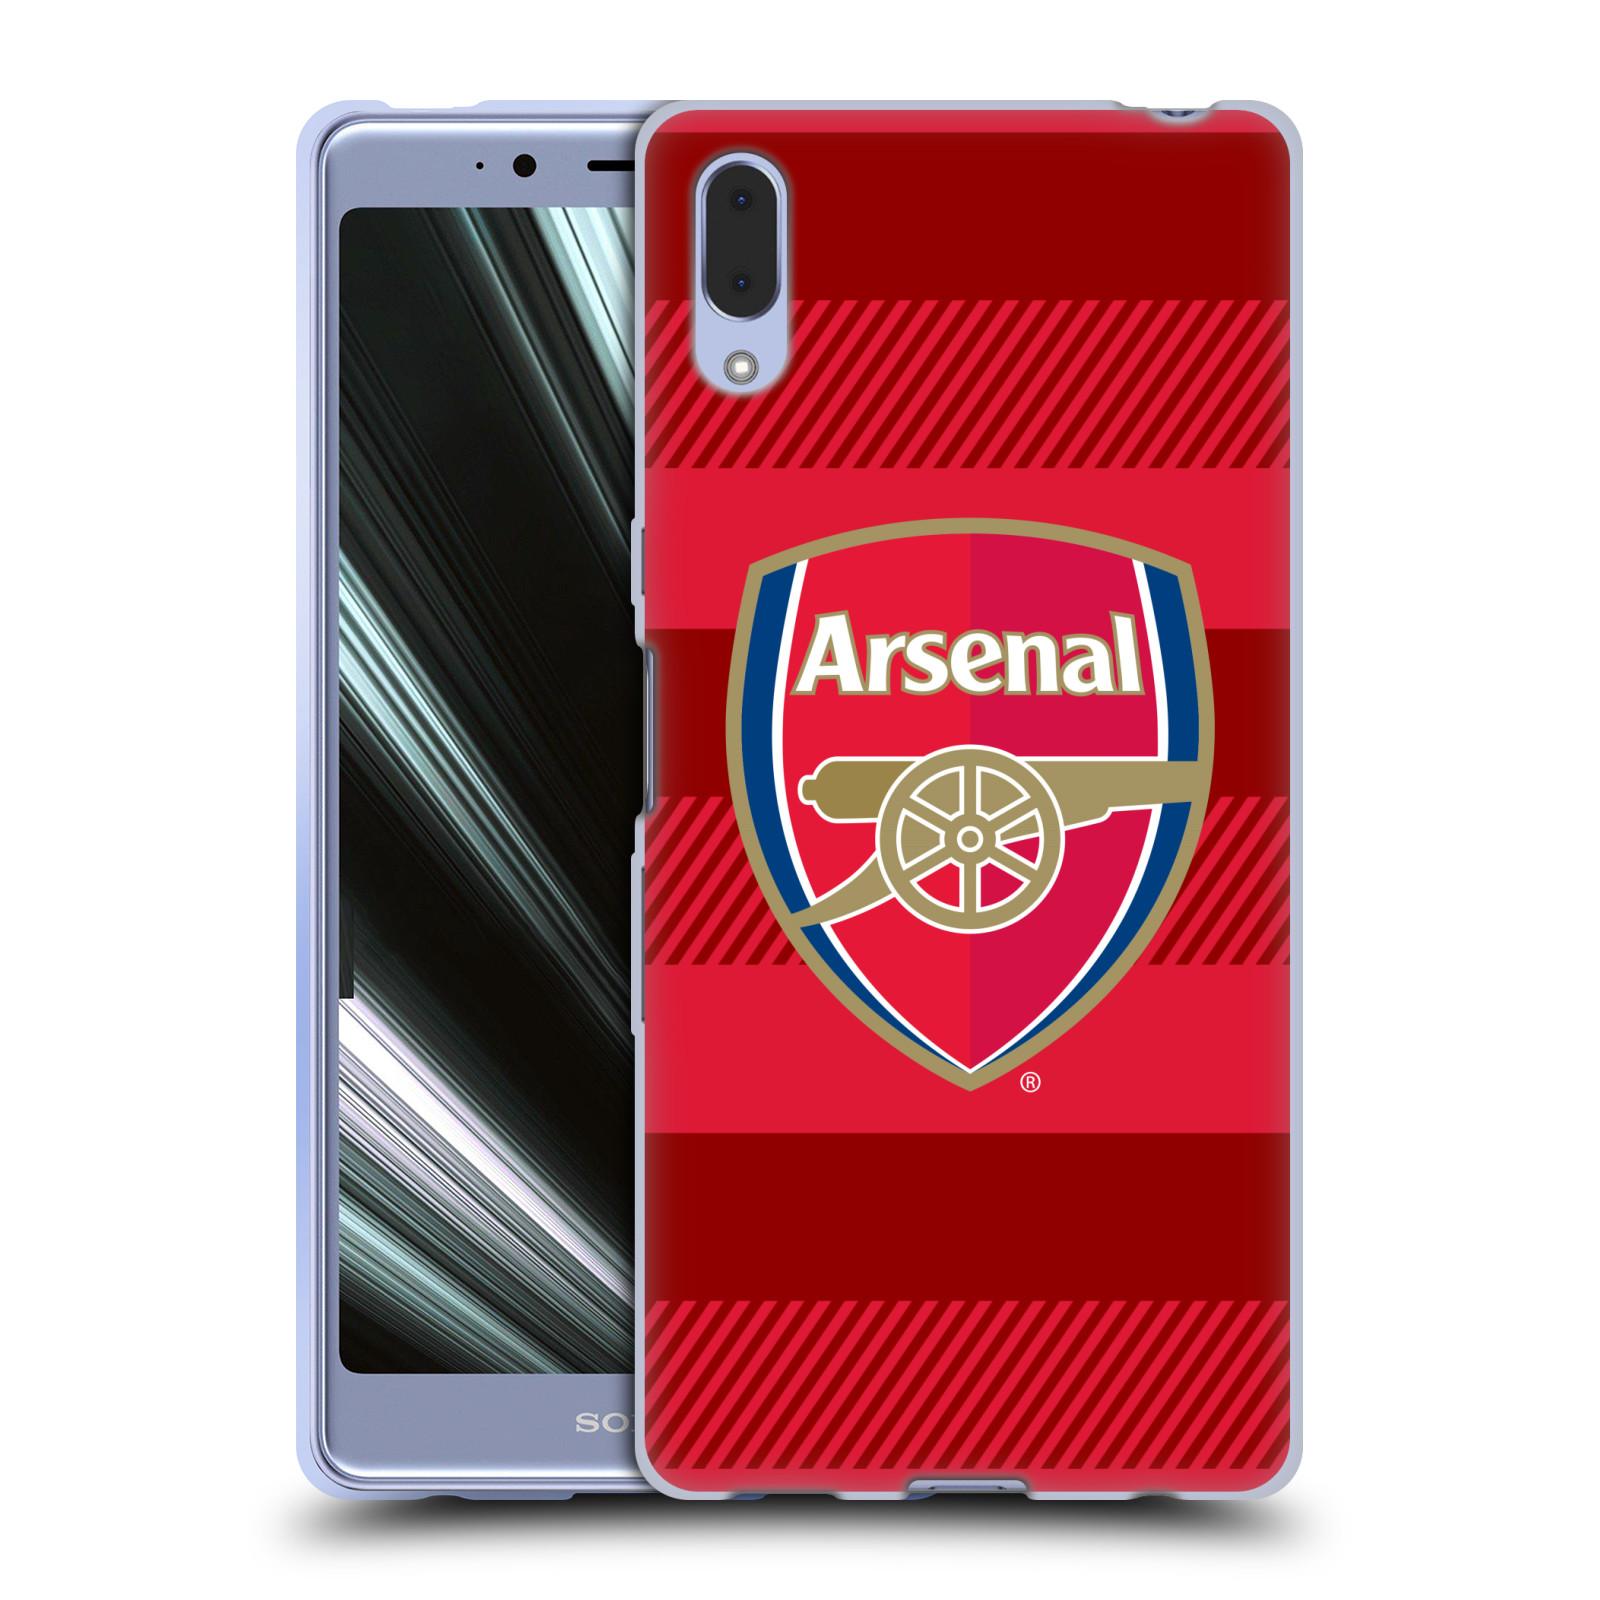 Silikonové pouzdro na mobil Sony Xperia L3 - Head Case - Arsenal FC - Logo s pruhy